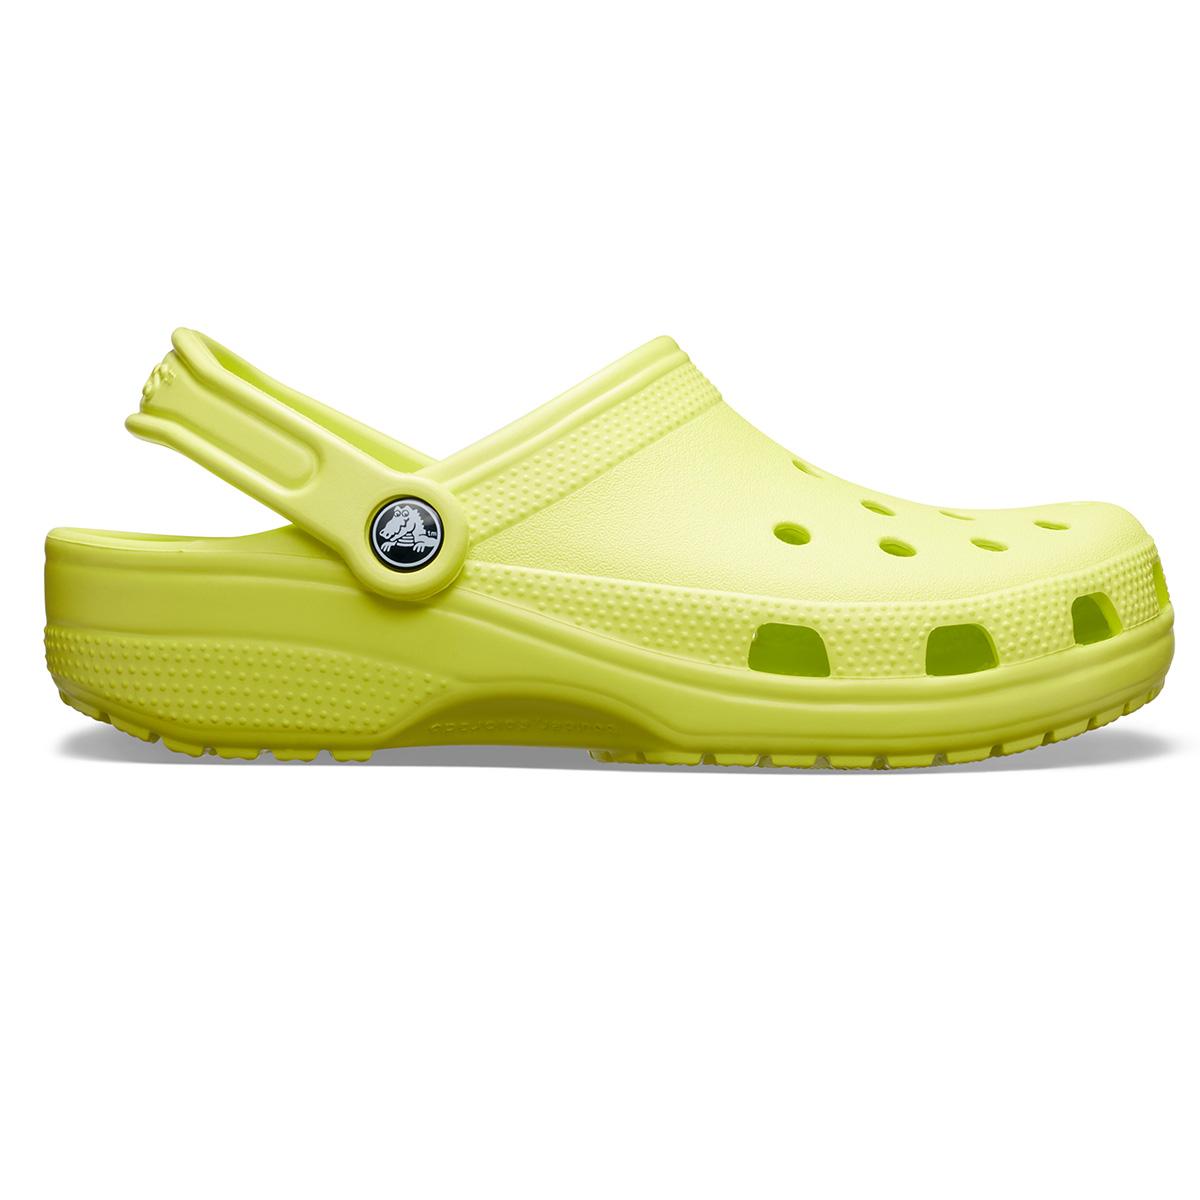 Crocs Classic - Turunçgil